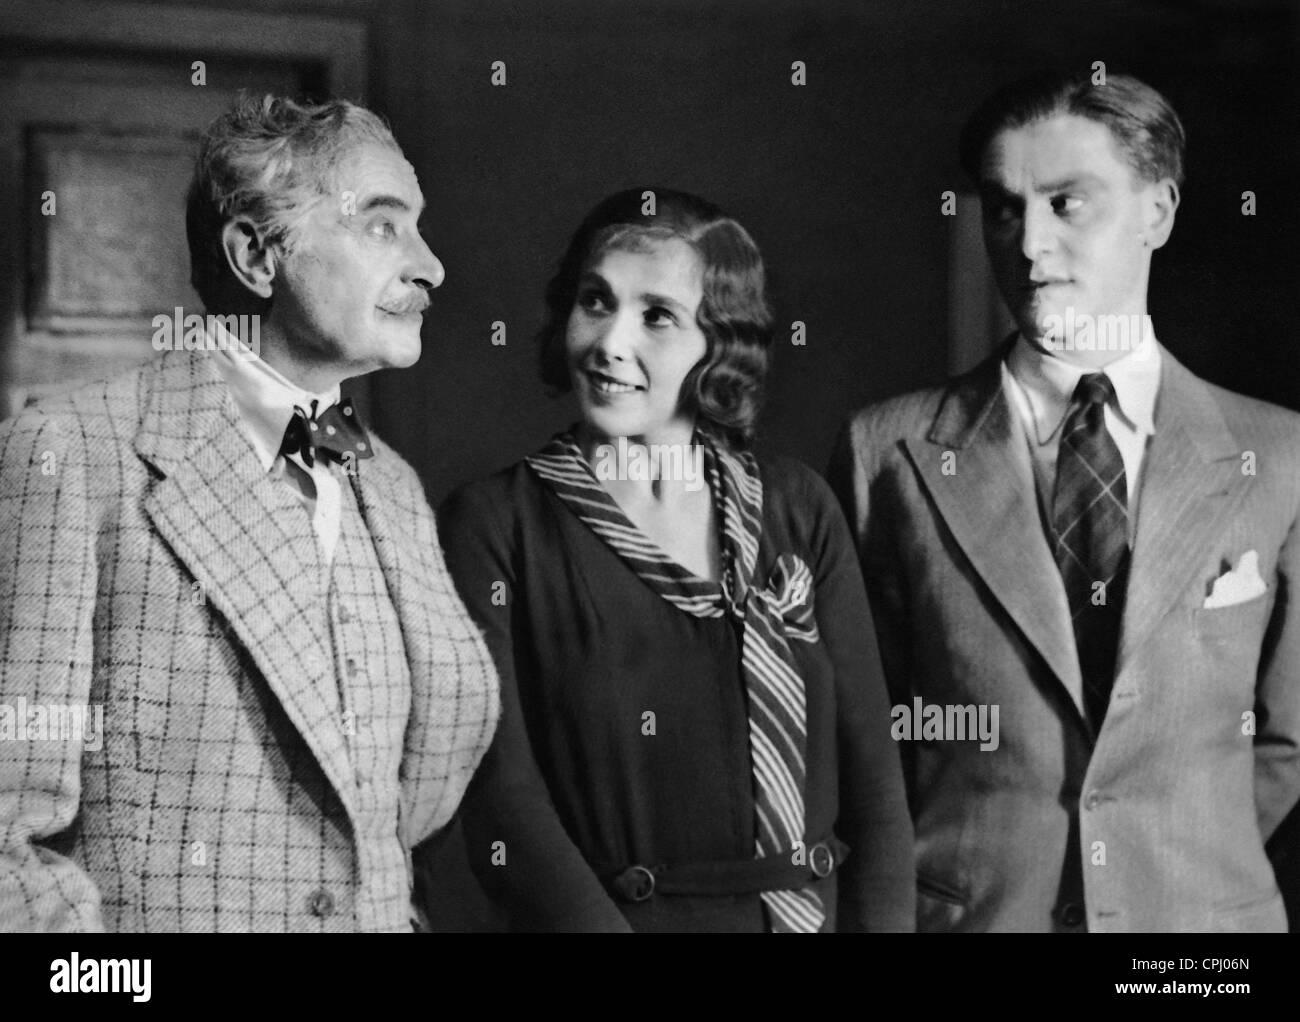 Albert Bassermann, Lili Darves and Adolf Wohlbrueck in 'Jemand', 1931 - Stock Image